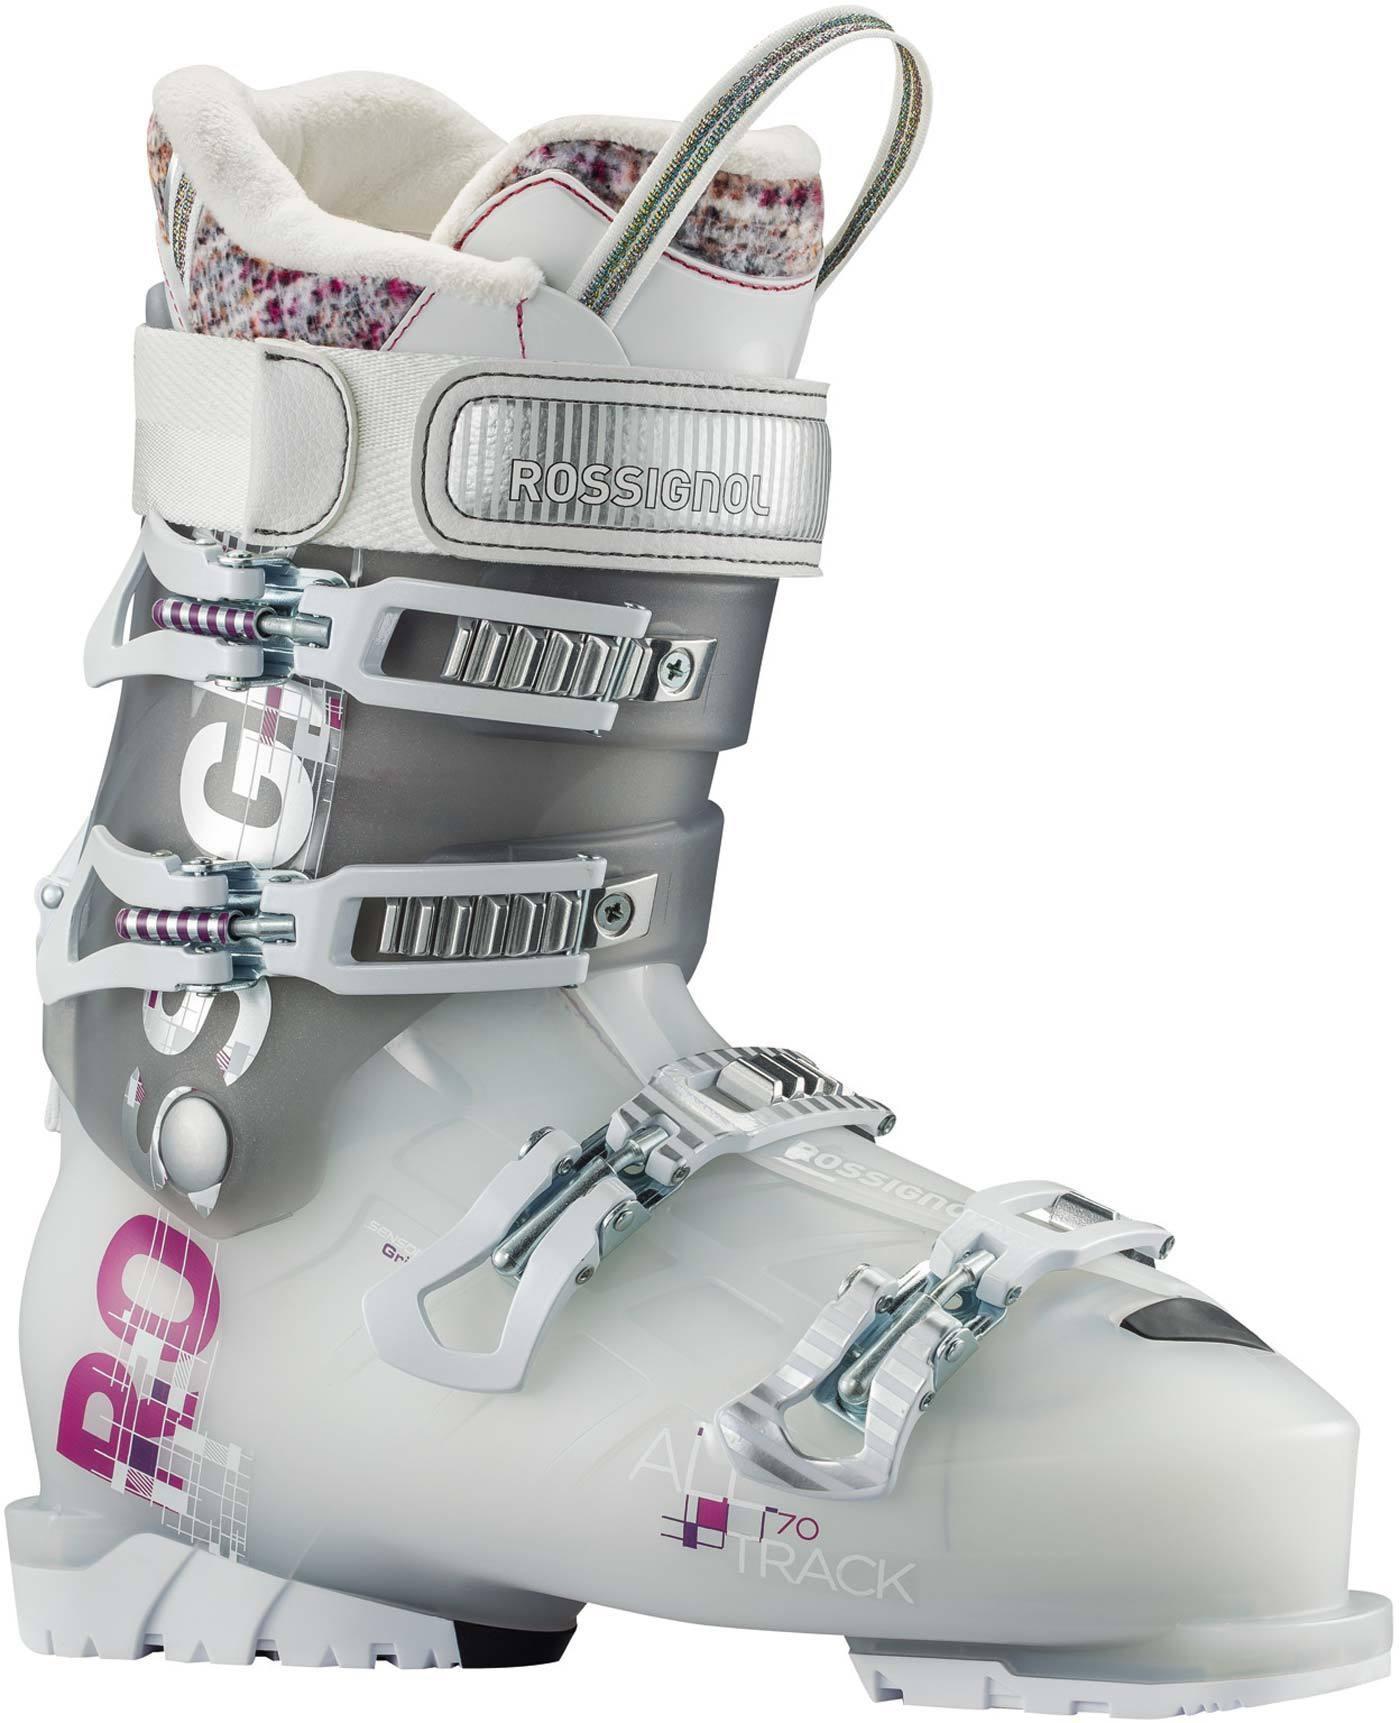 Salomon Quest Access 90 Ski Boots.Salomon Quest 10. Salomon X Pro 90 ... 2969f750617